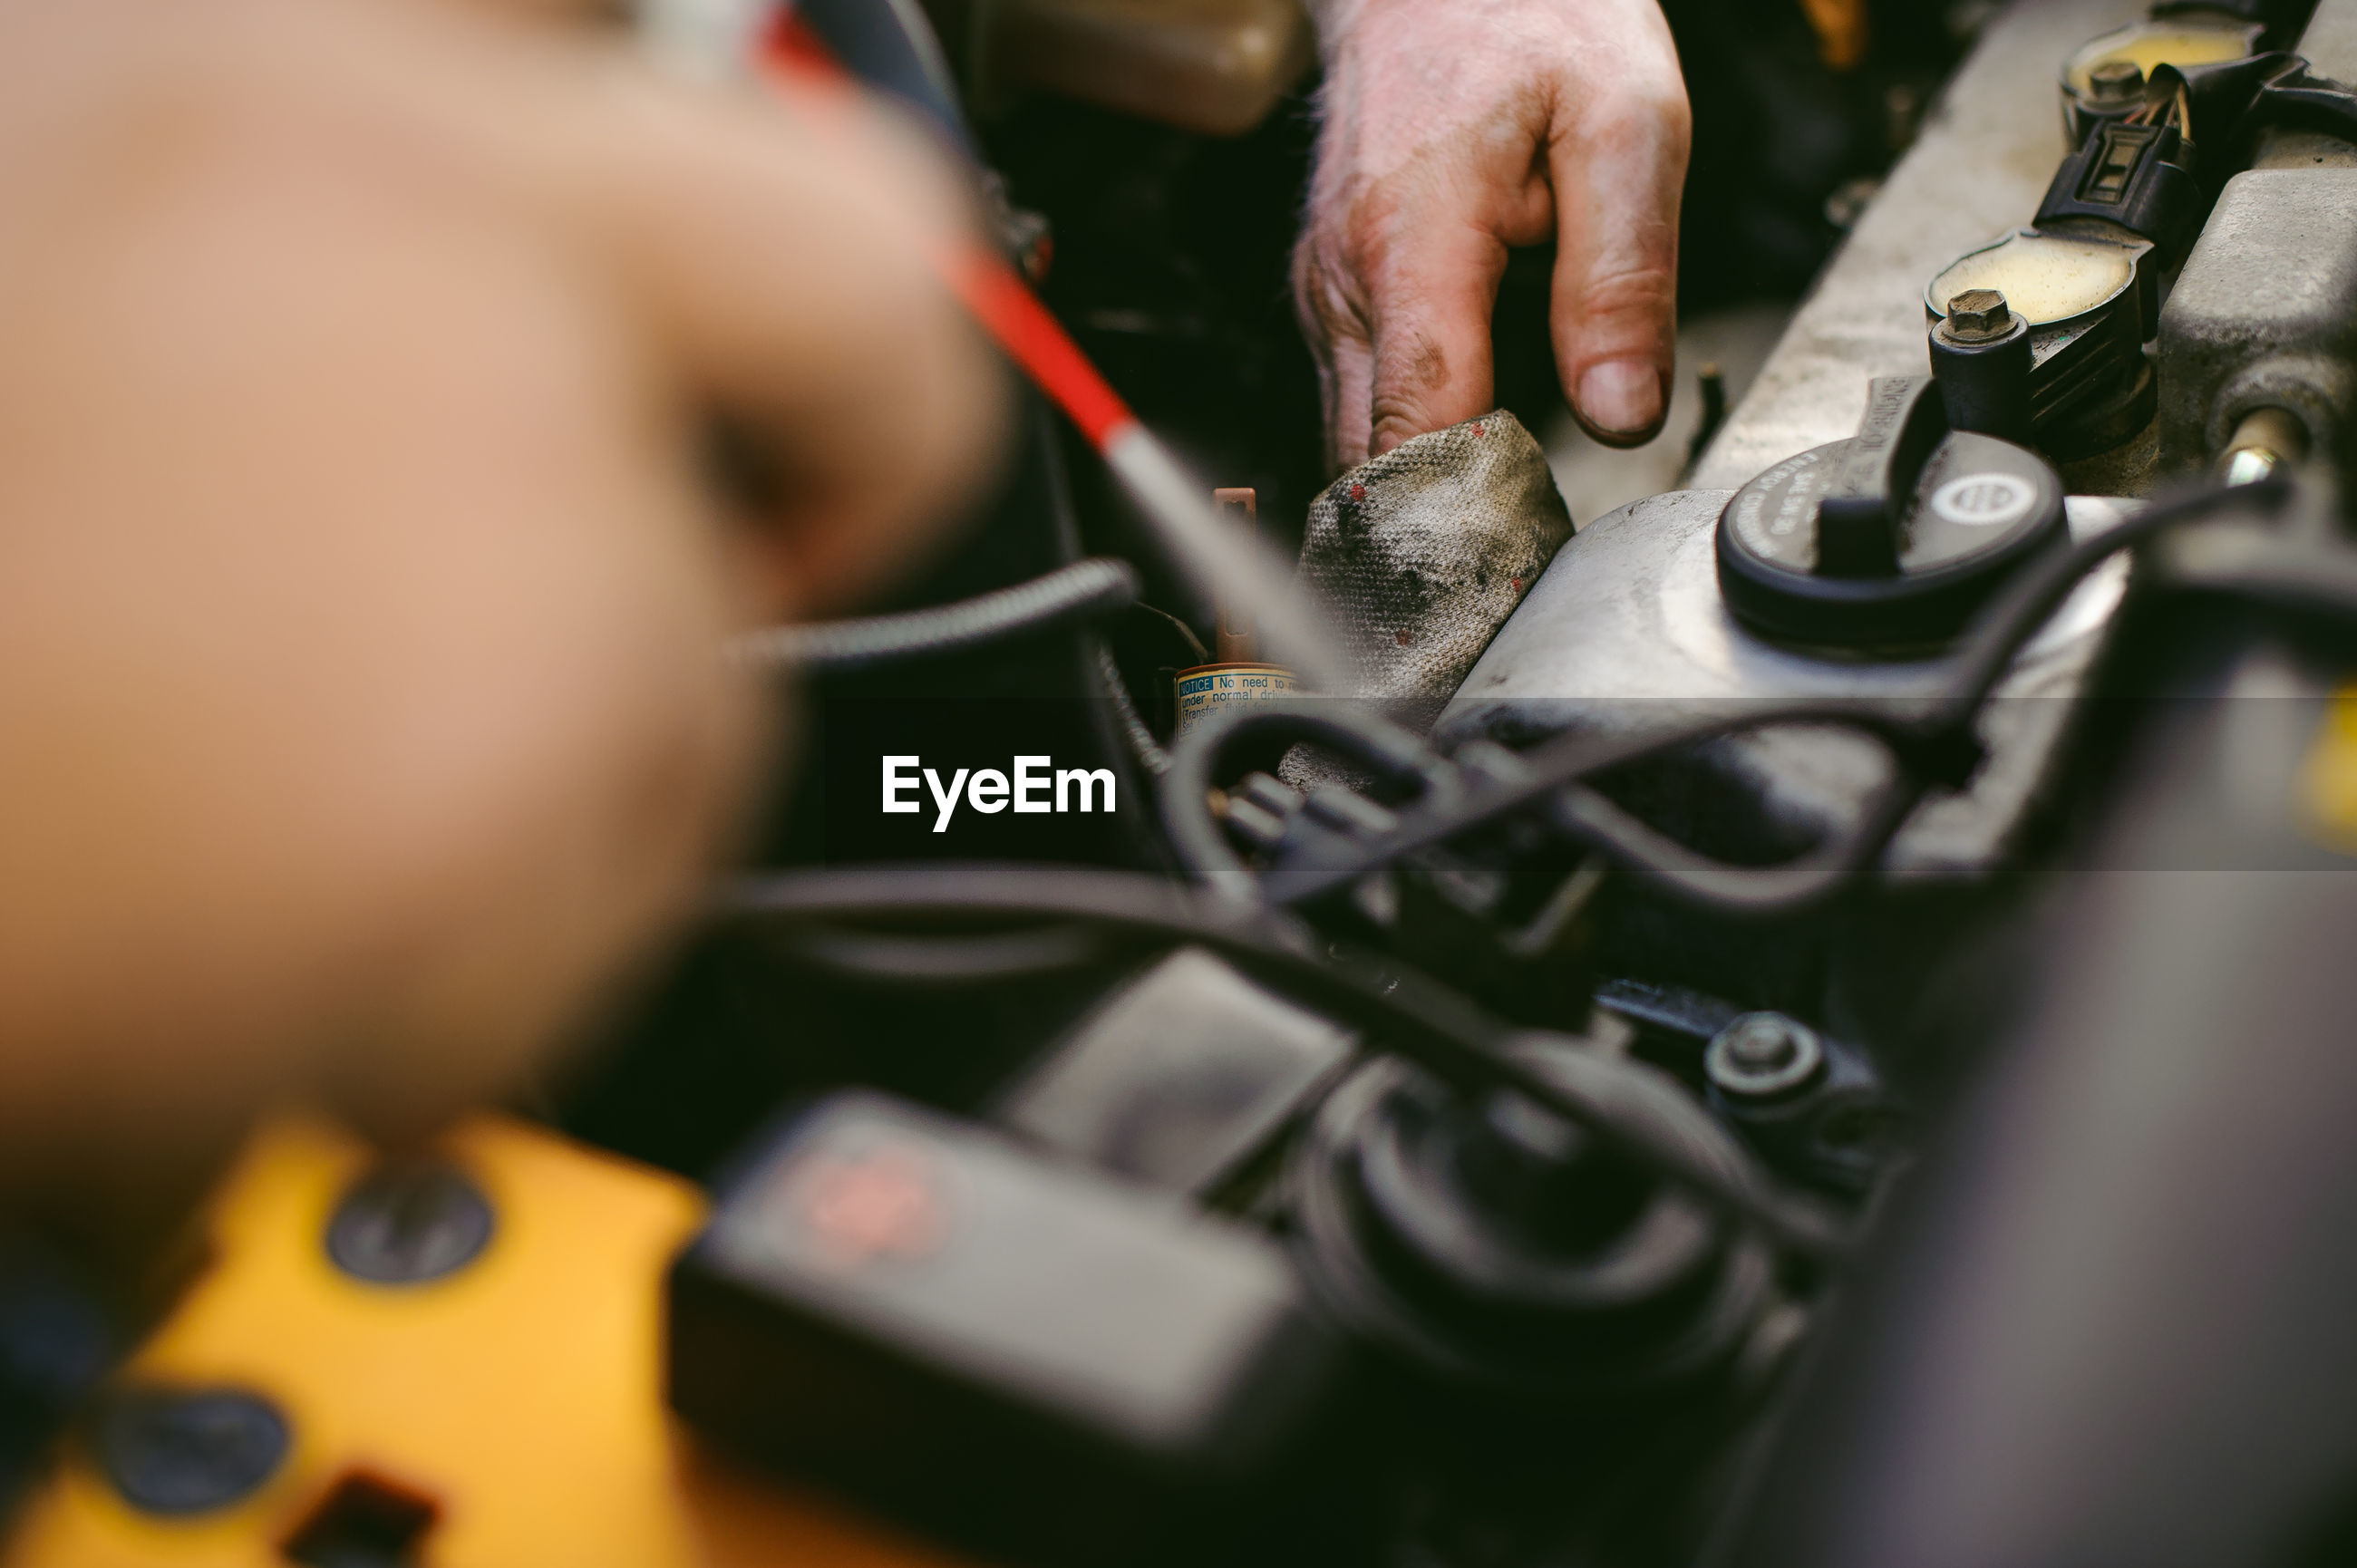 Close-up of hands repairing car engine